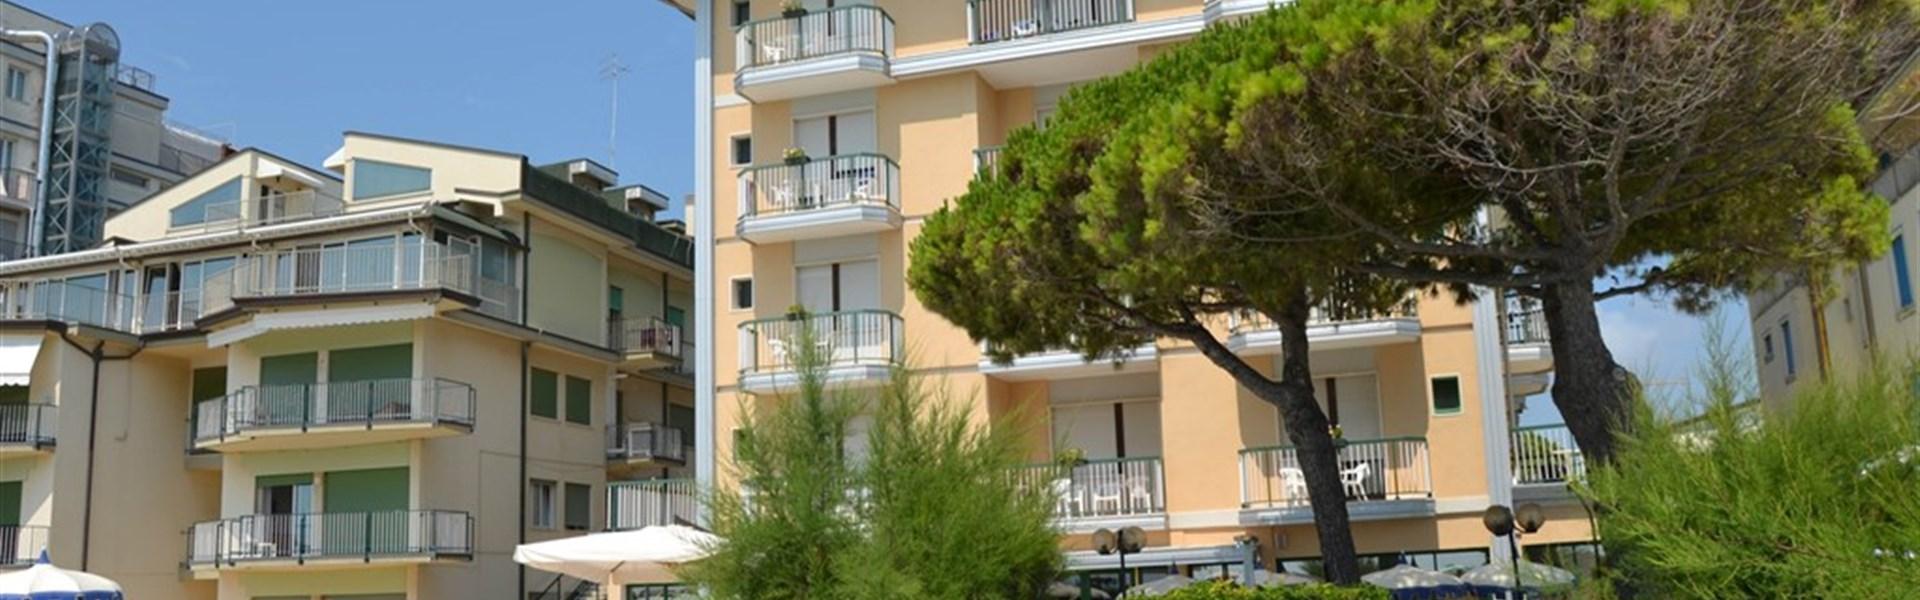 Hotel Florida -